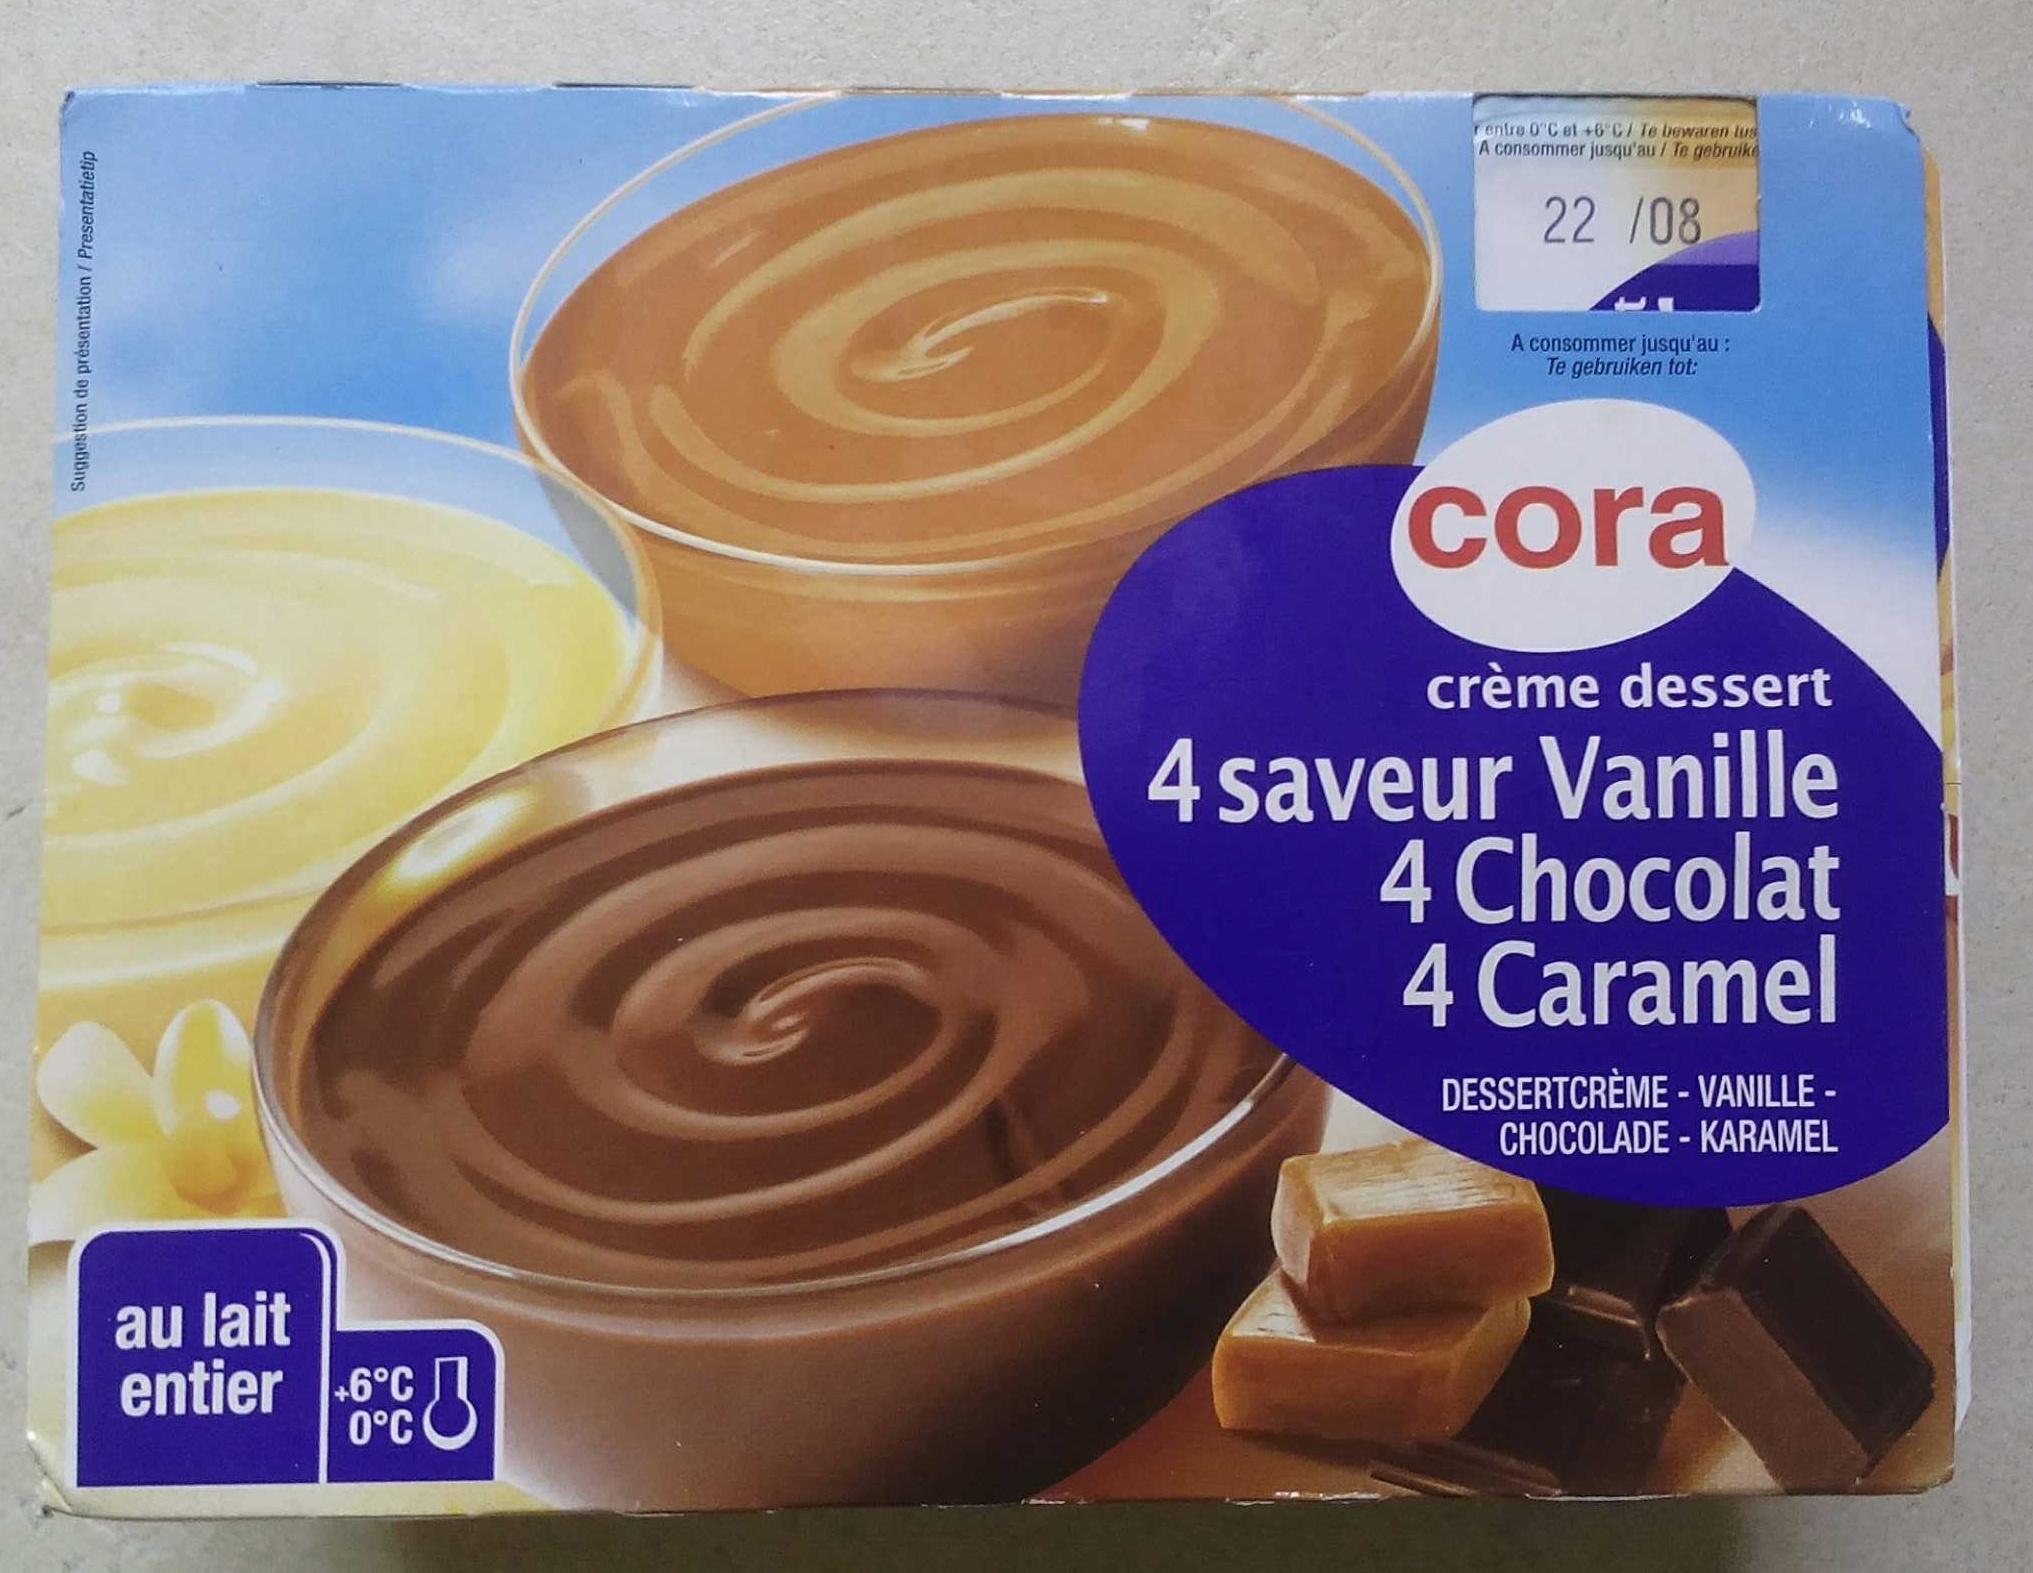 cr me dessert 4 saveur vanille 4 chocolat 4 caramel. Black Bedroom Furniture Sets. Home Design Ideas